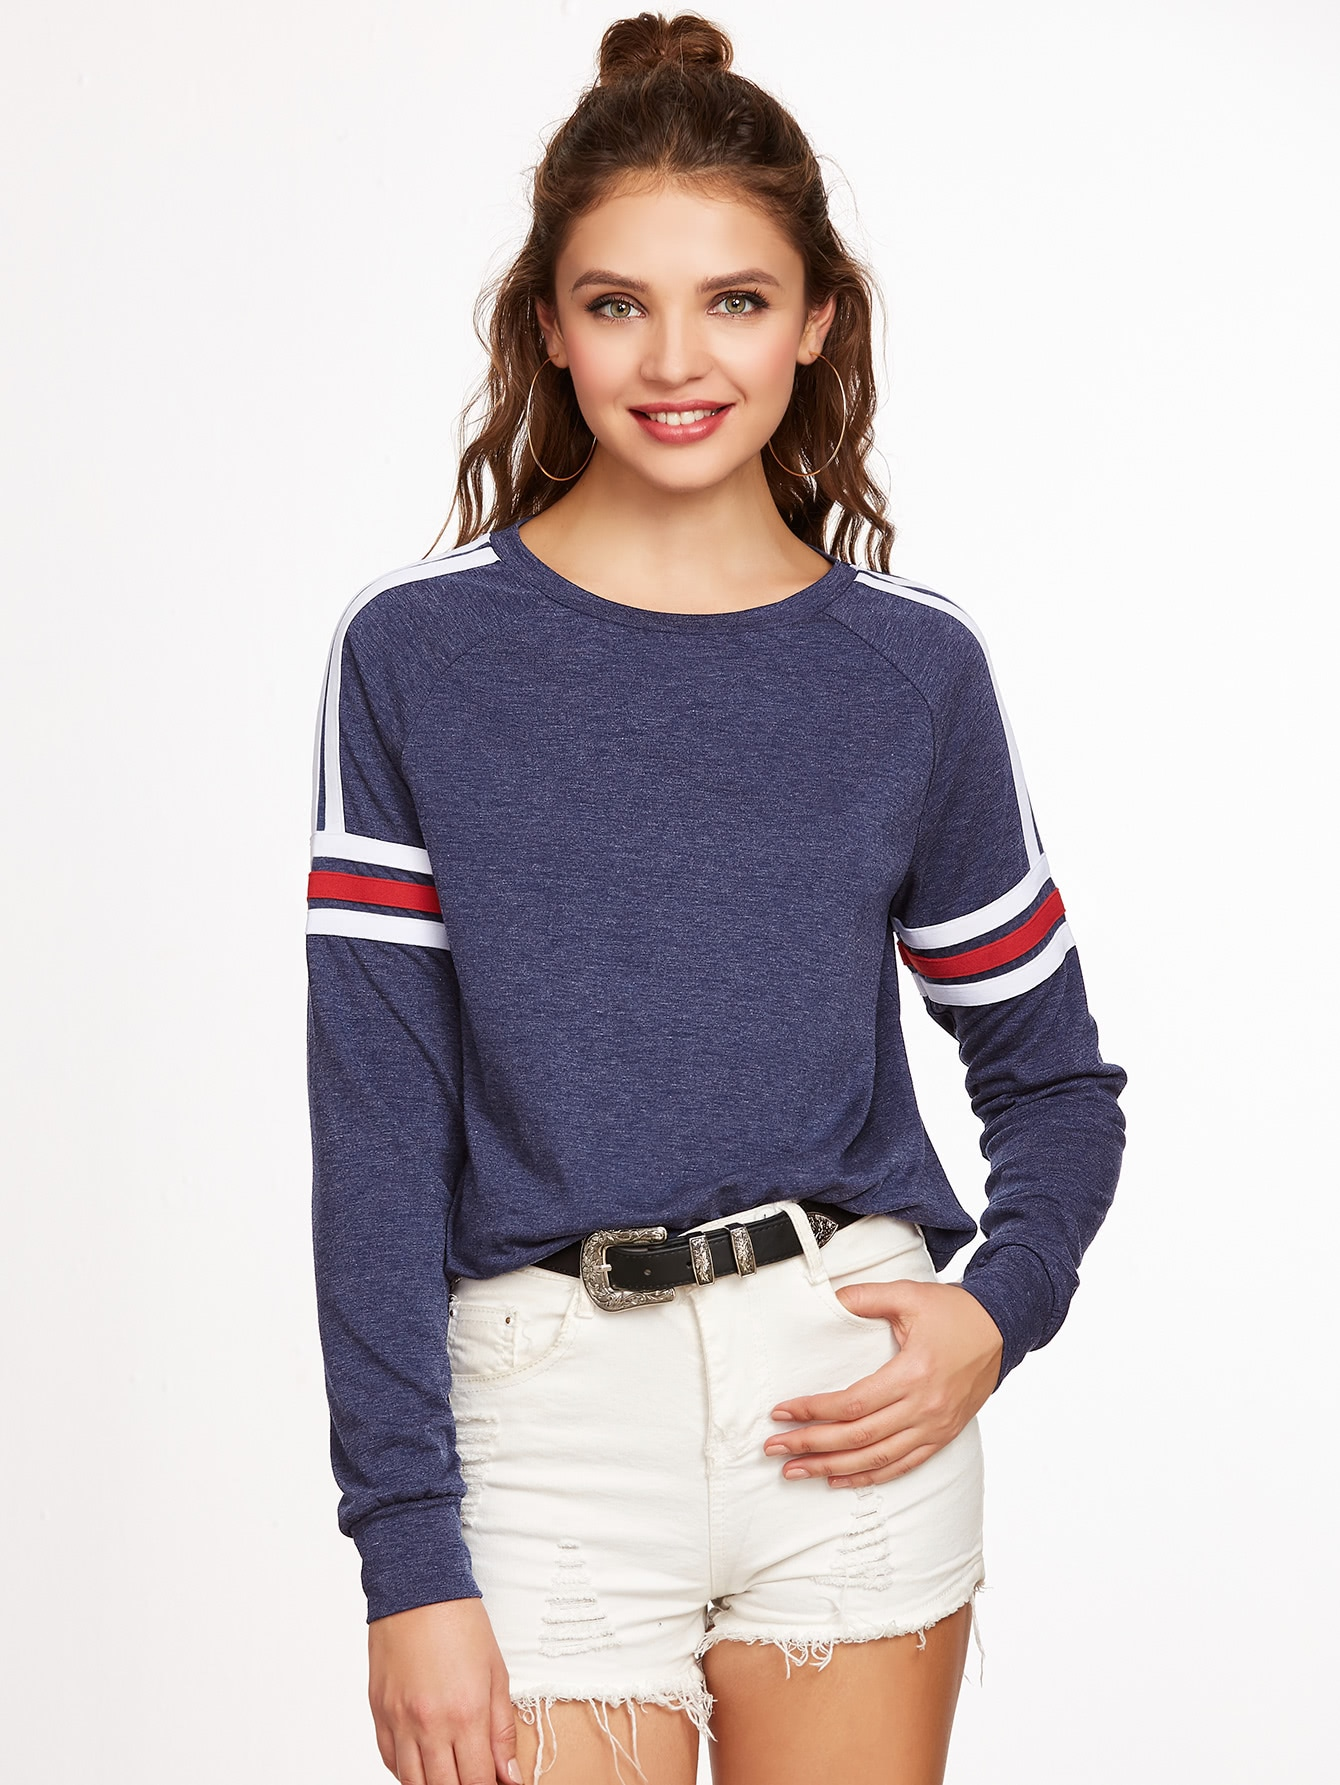 Navy Heathered Varsity Striped Raglan Sleeve Sweatshirt two tone raglan sleeve sweatshirt